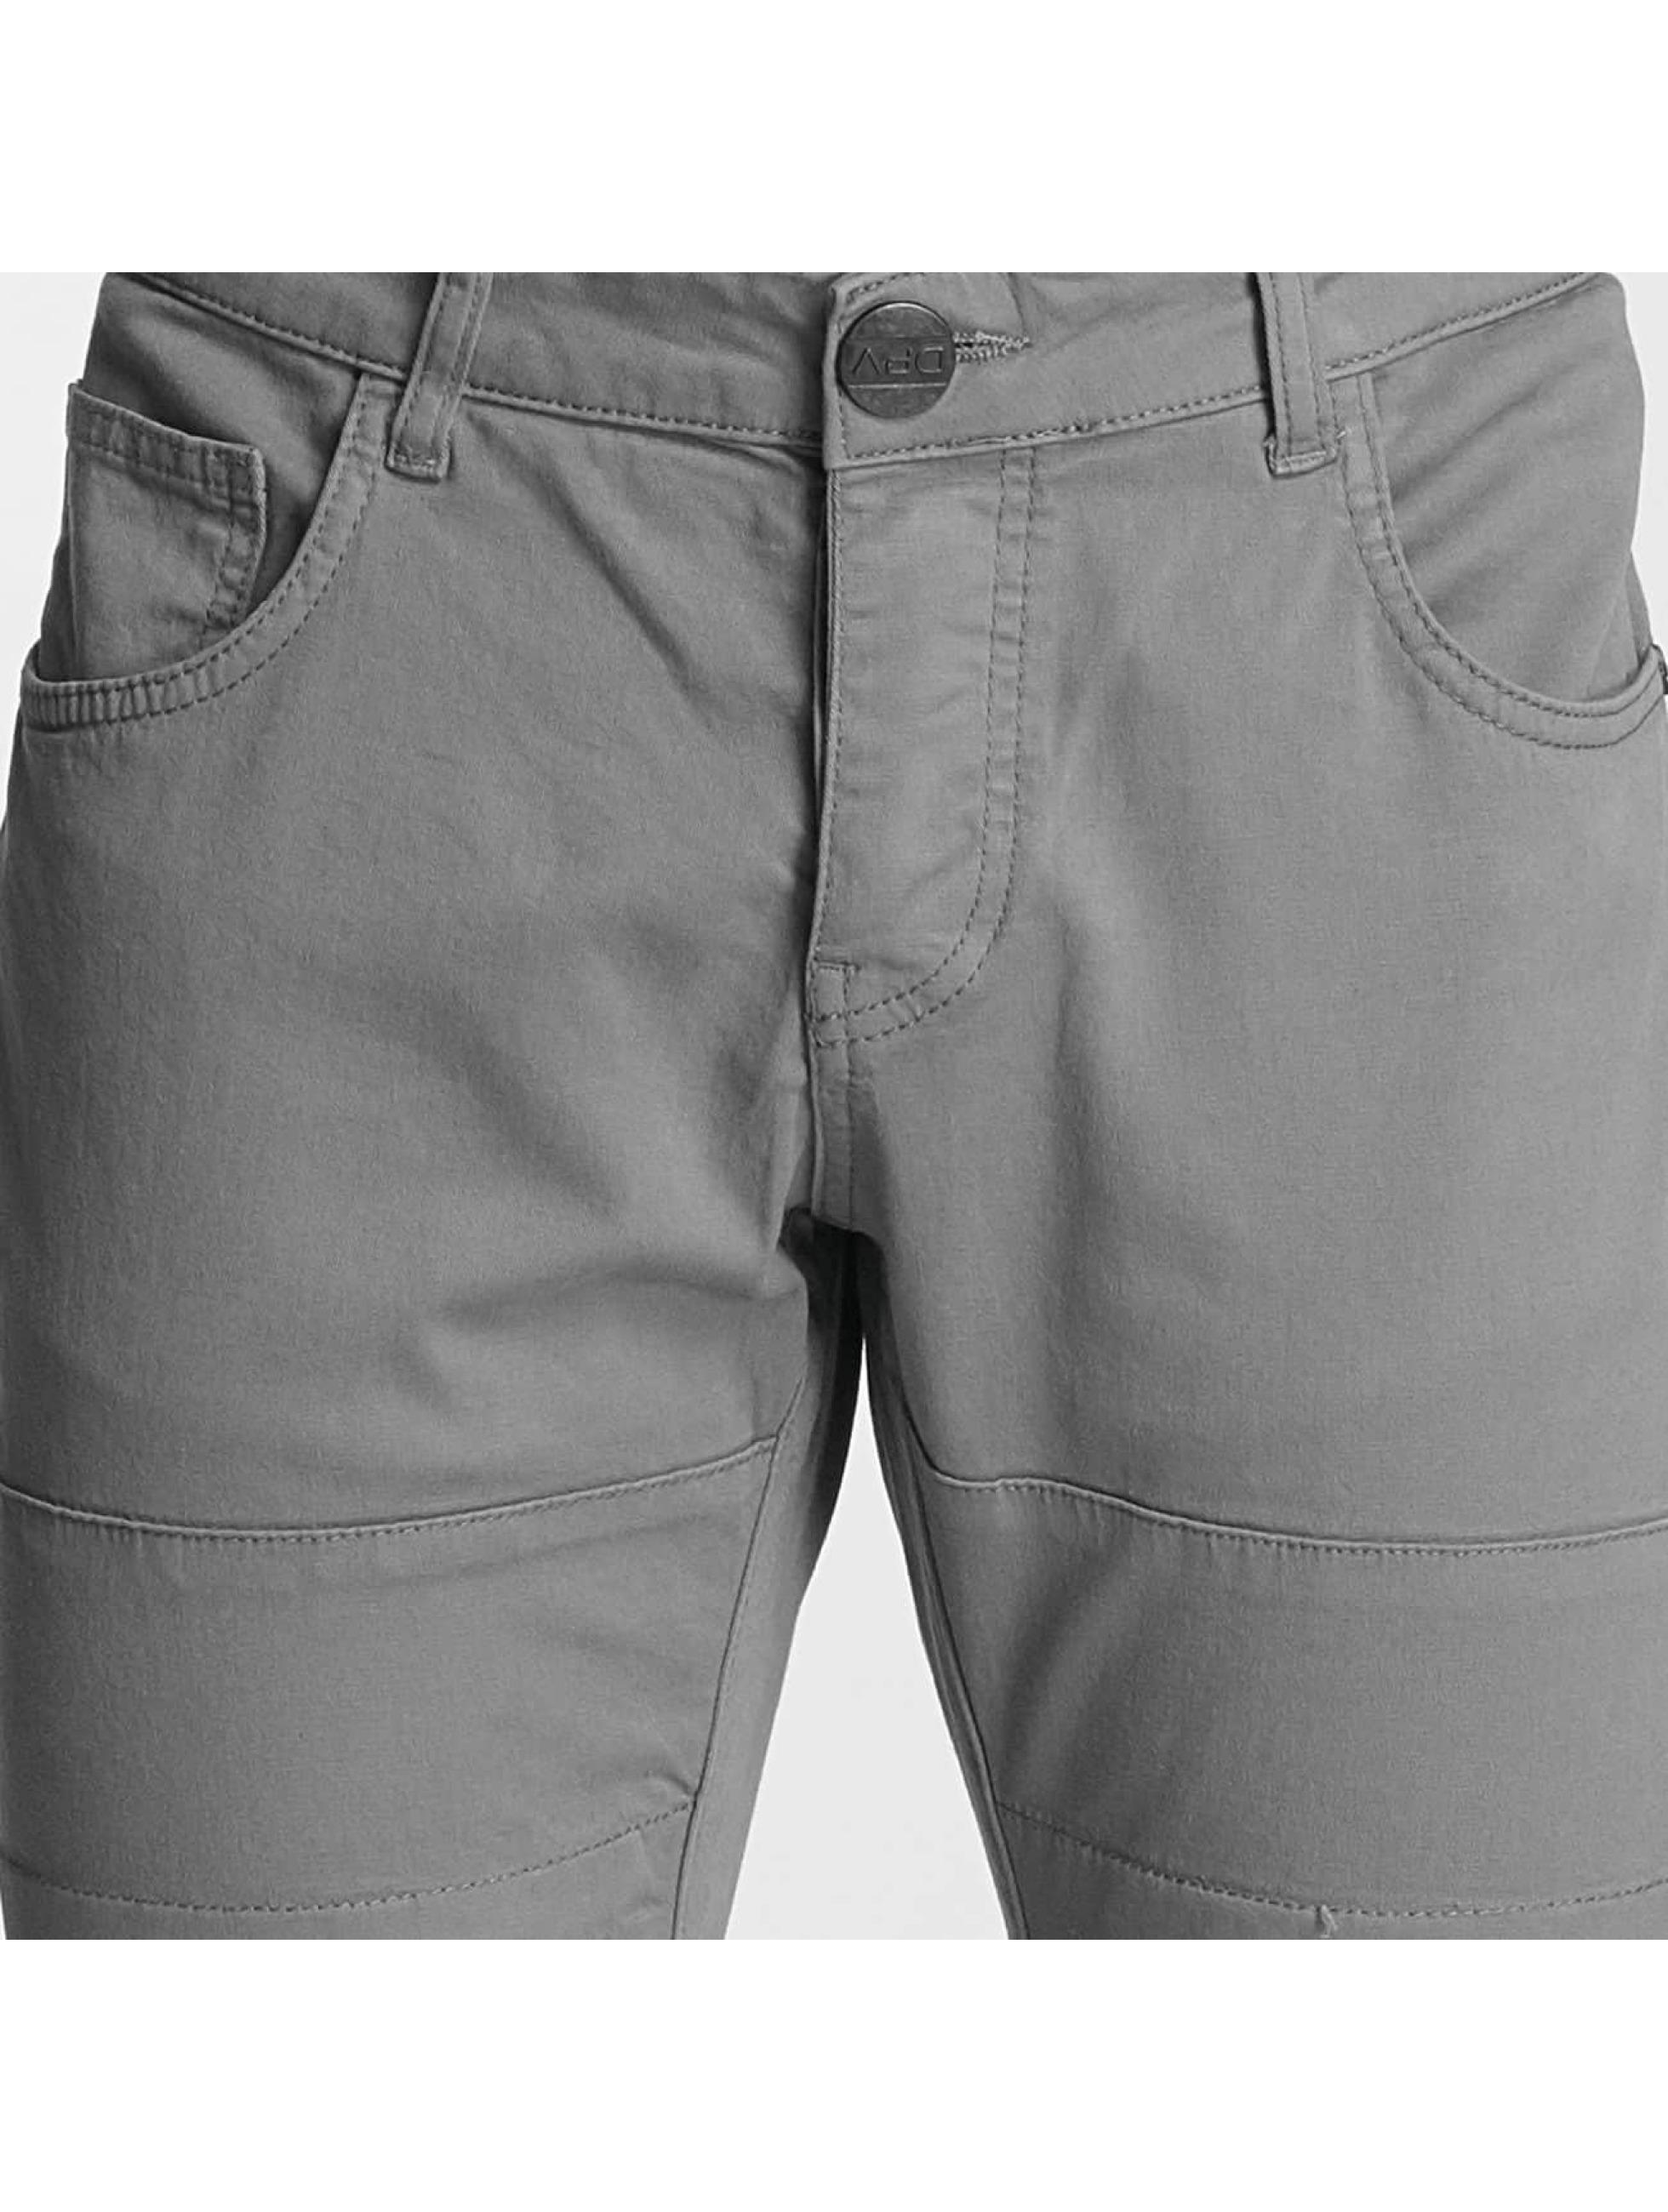 2Y Skinny Jeans Tiron grey